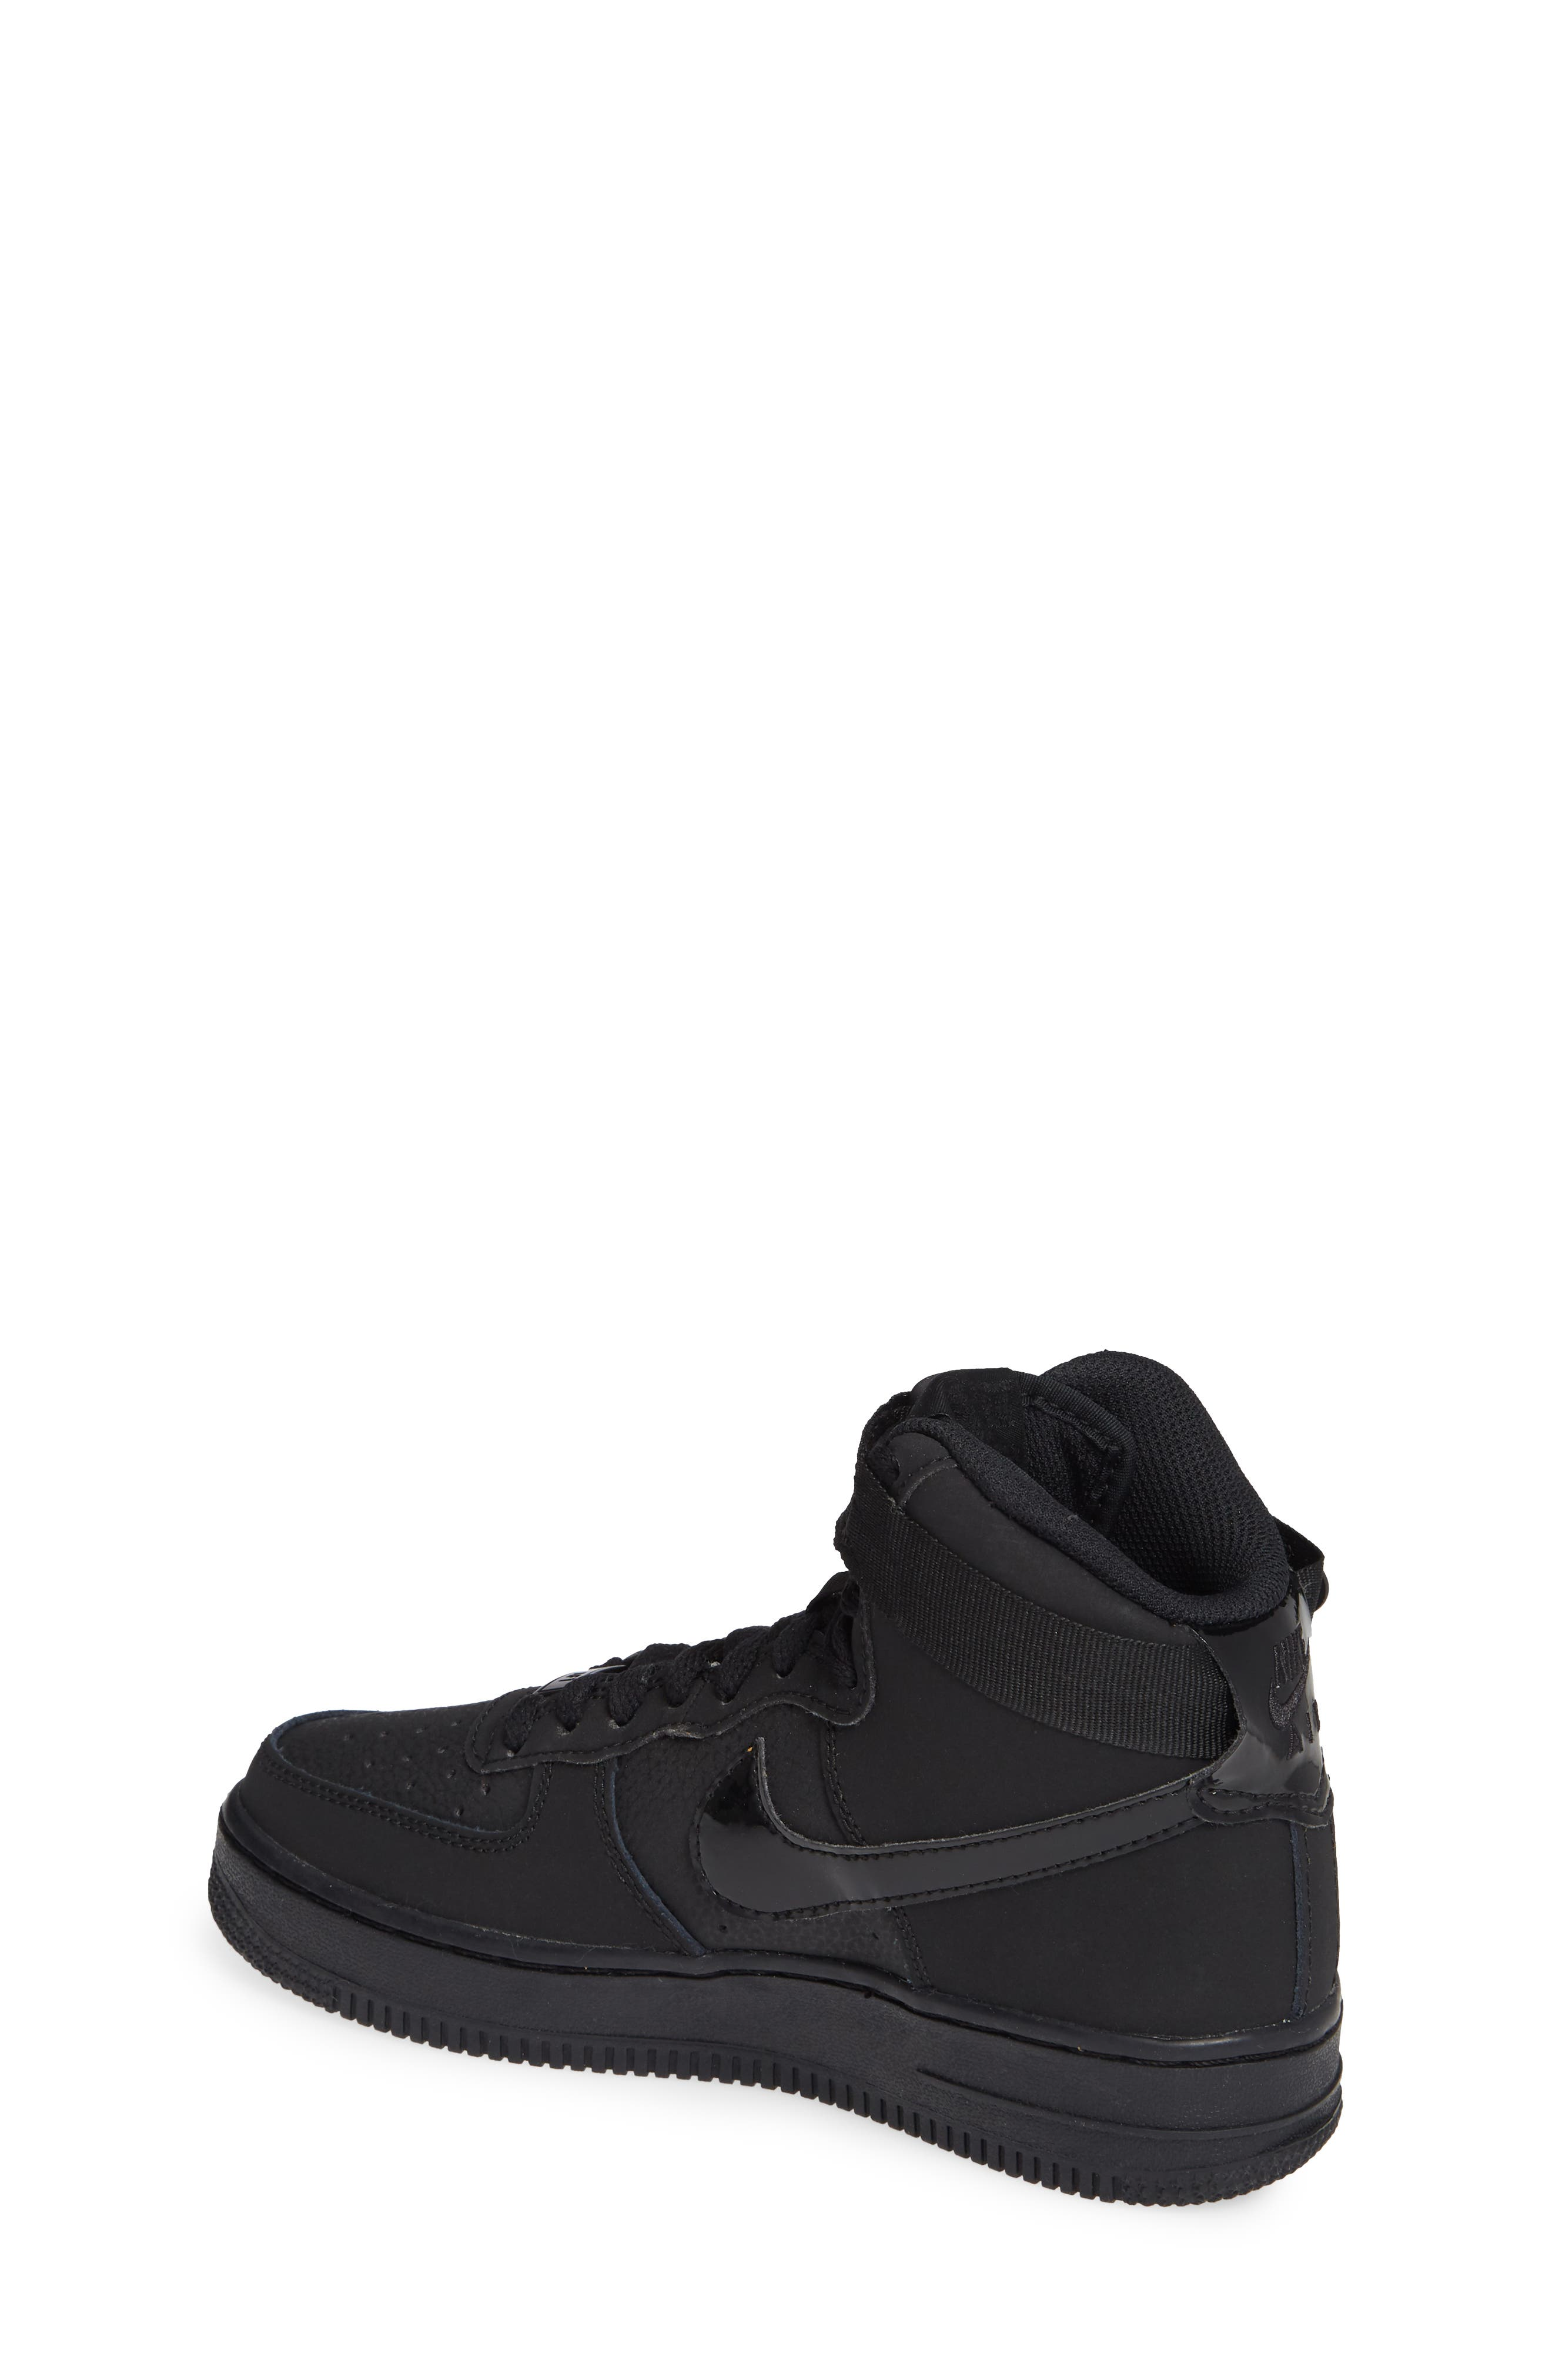 NIKE, Air Force 1 High Top Sneaker, Alternate thumbnail 2, color, 001